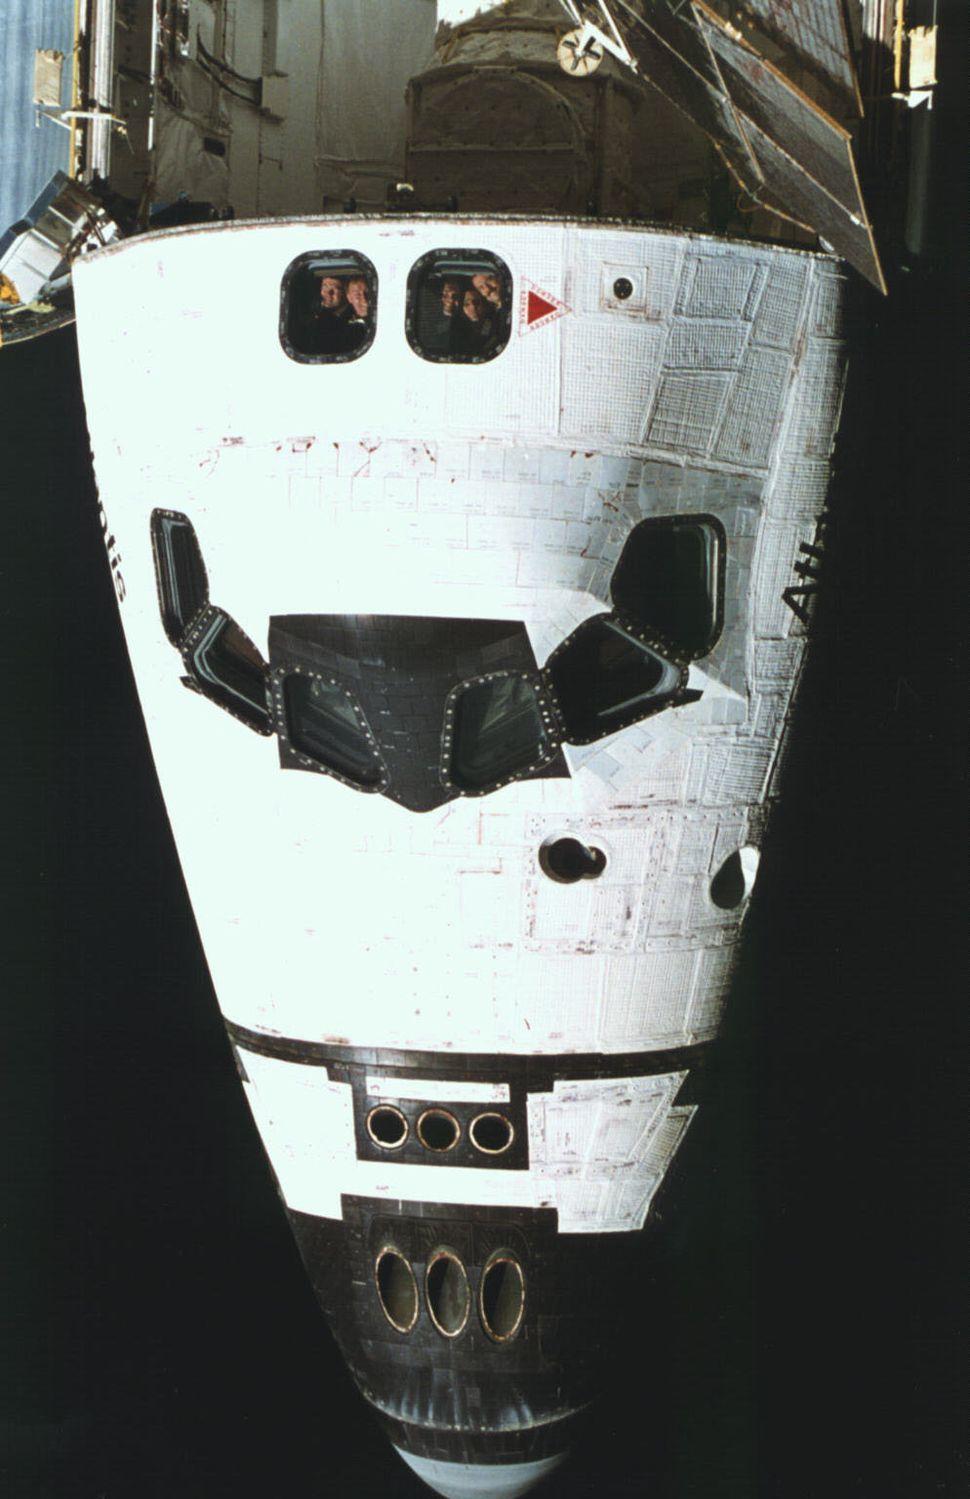 astronaut in orbit 1972 - photo #46